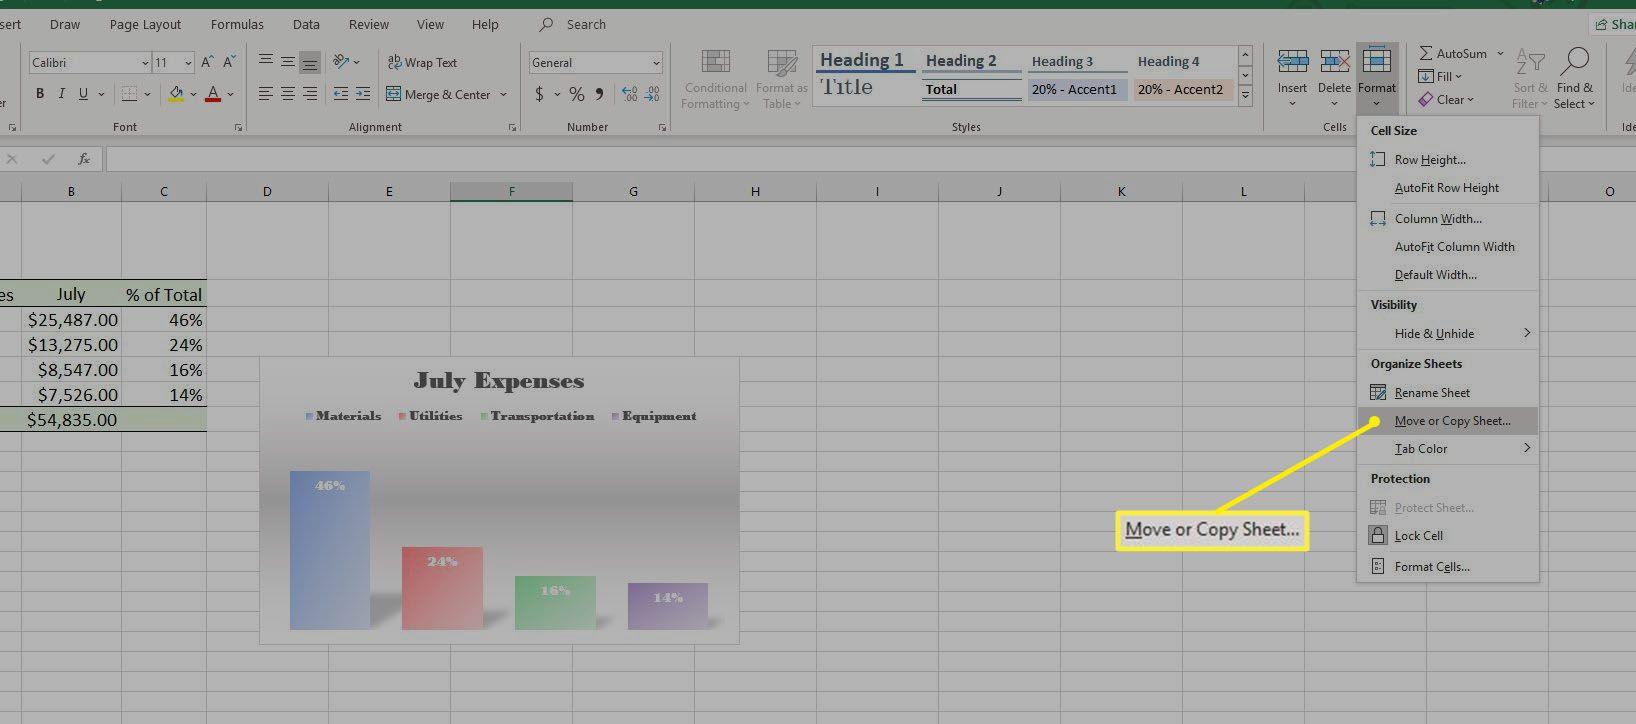 Screenshot of Move or Copy Sheet in Format drop-down